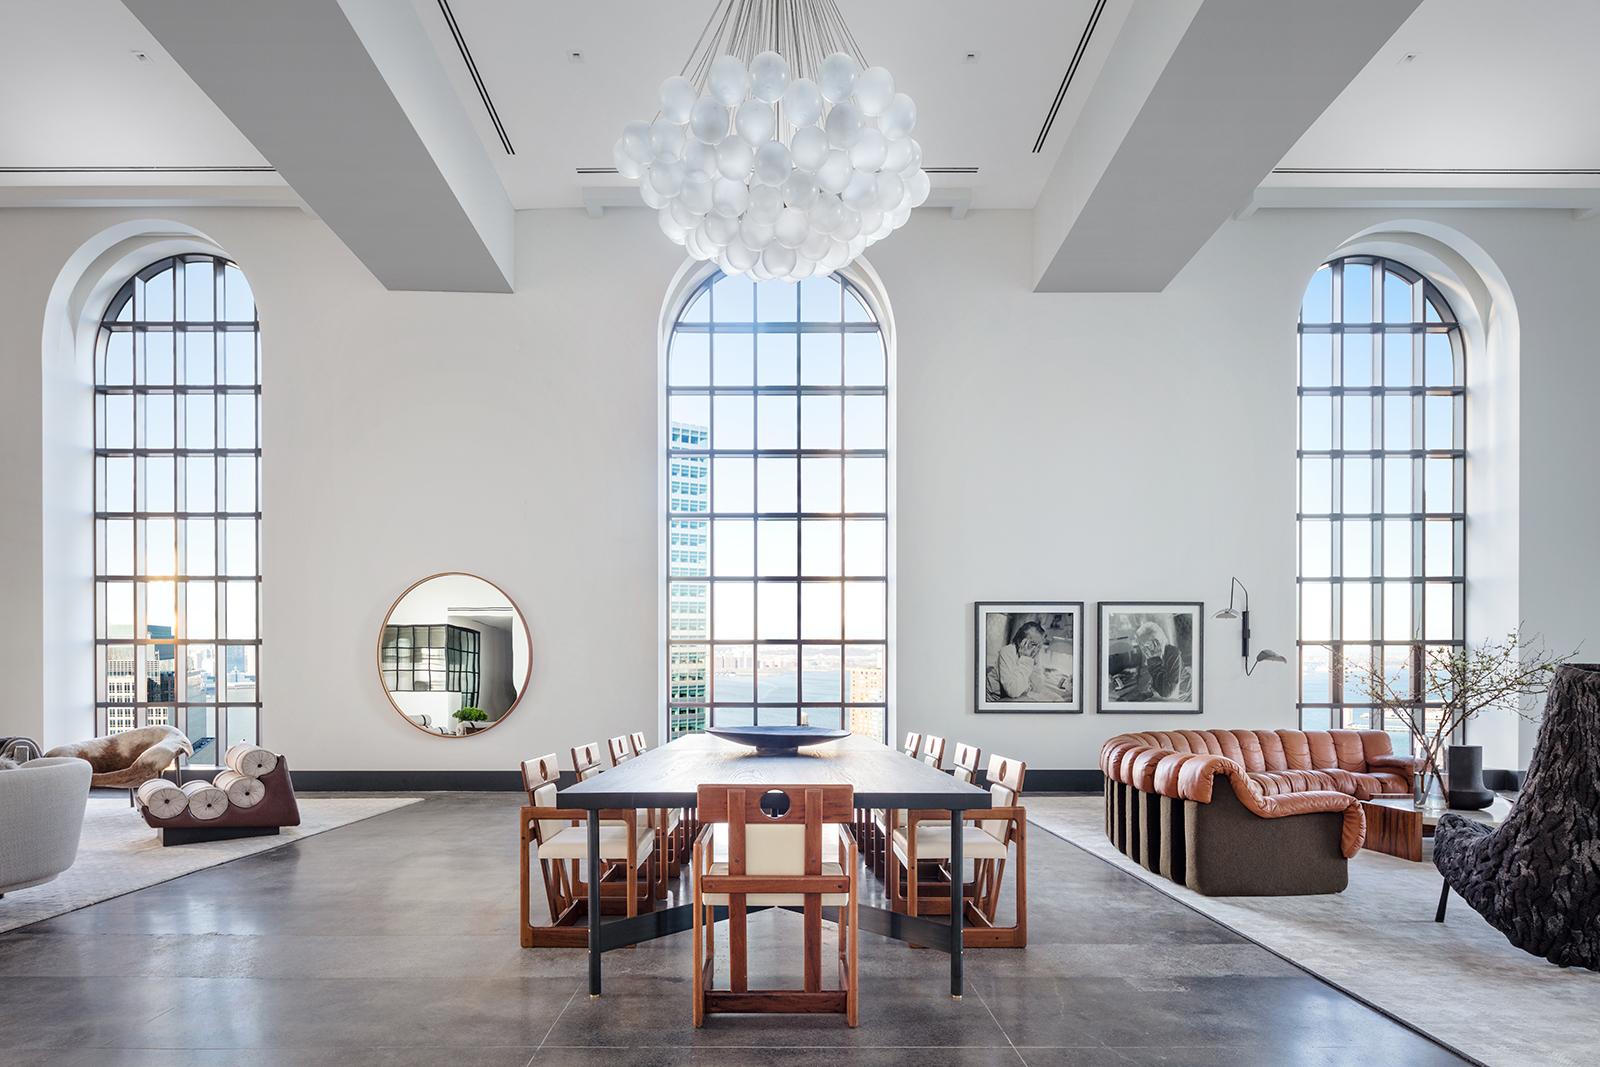 Lavish Penthouse Hits The Market At One Hundred Barclay For $39.95 Million